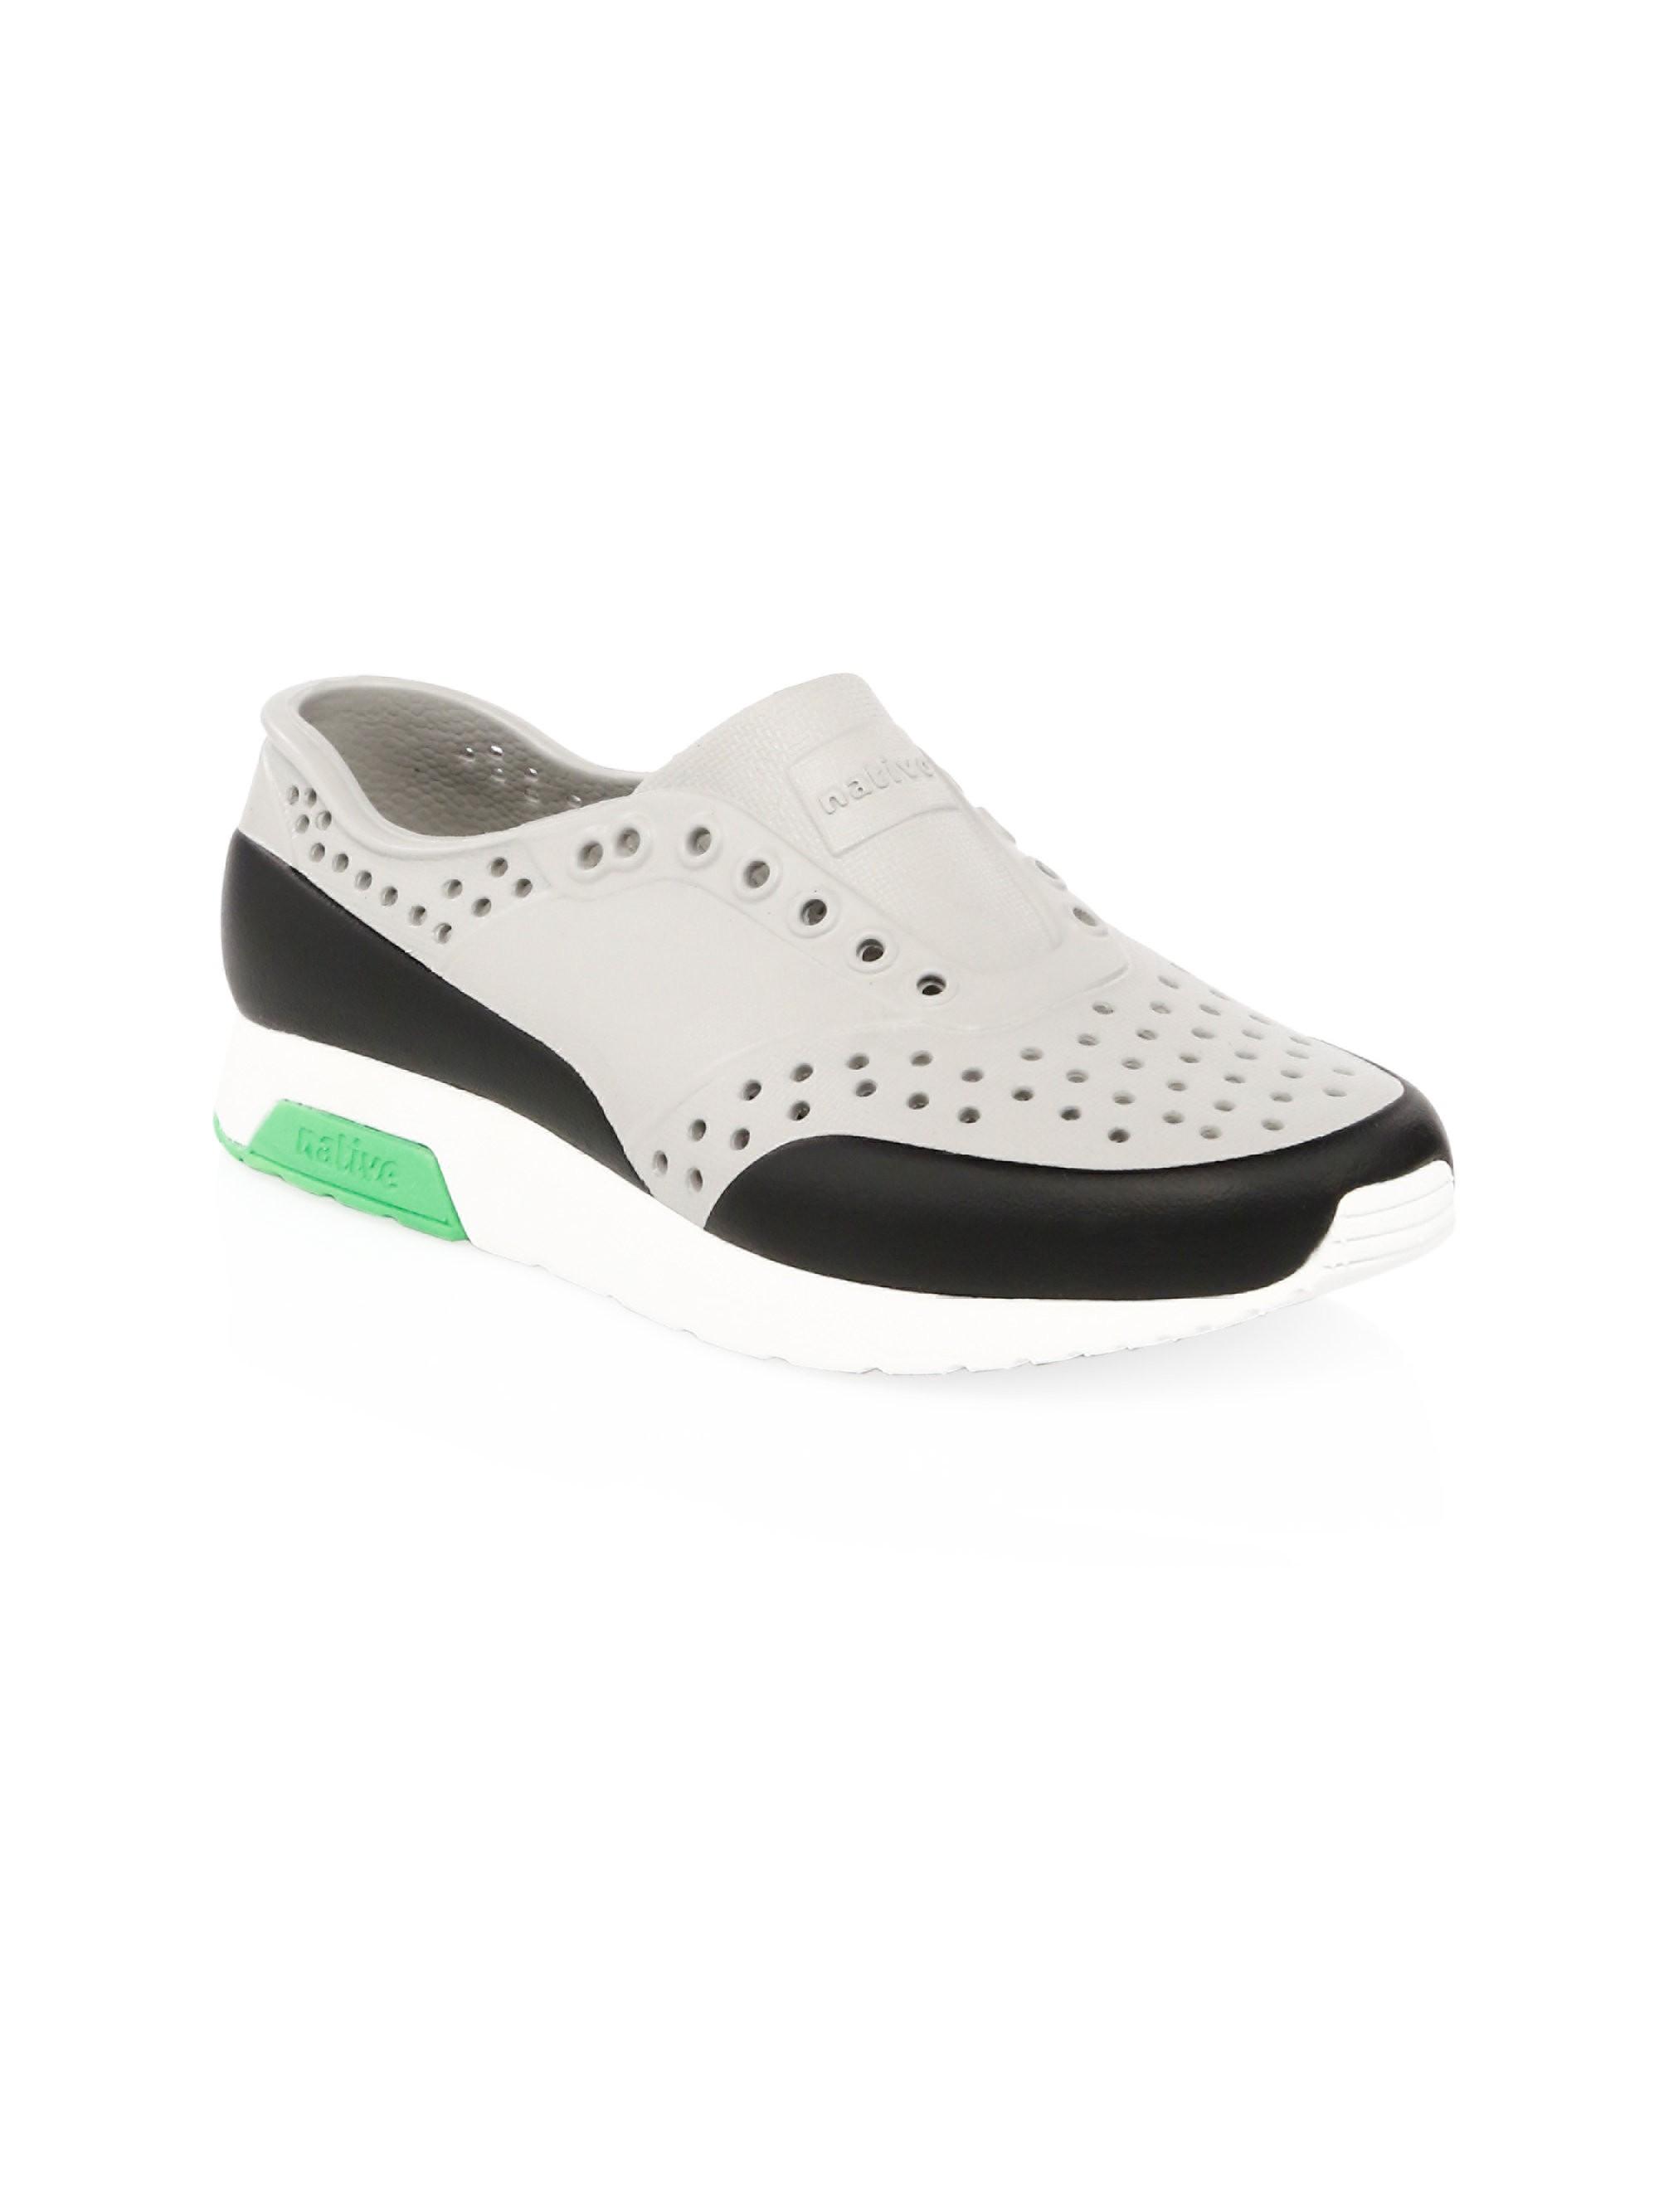 98ac9b60ff298 Native Shoes Kids Toddler's & Kid's Lennox Slip-On Sneakers - Grey ...